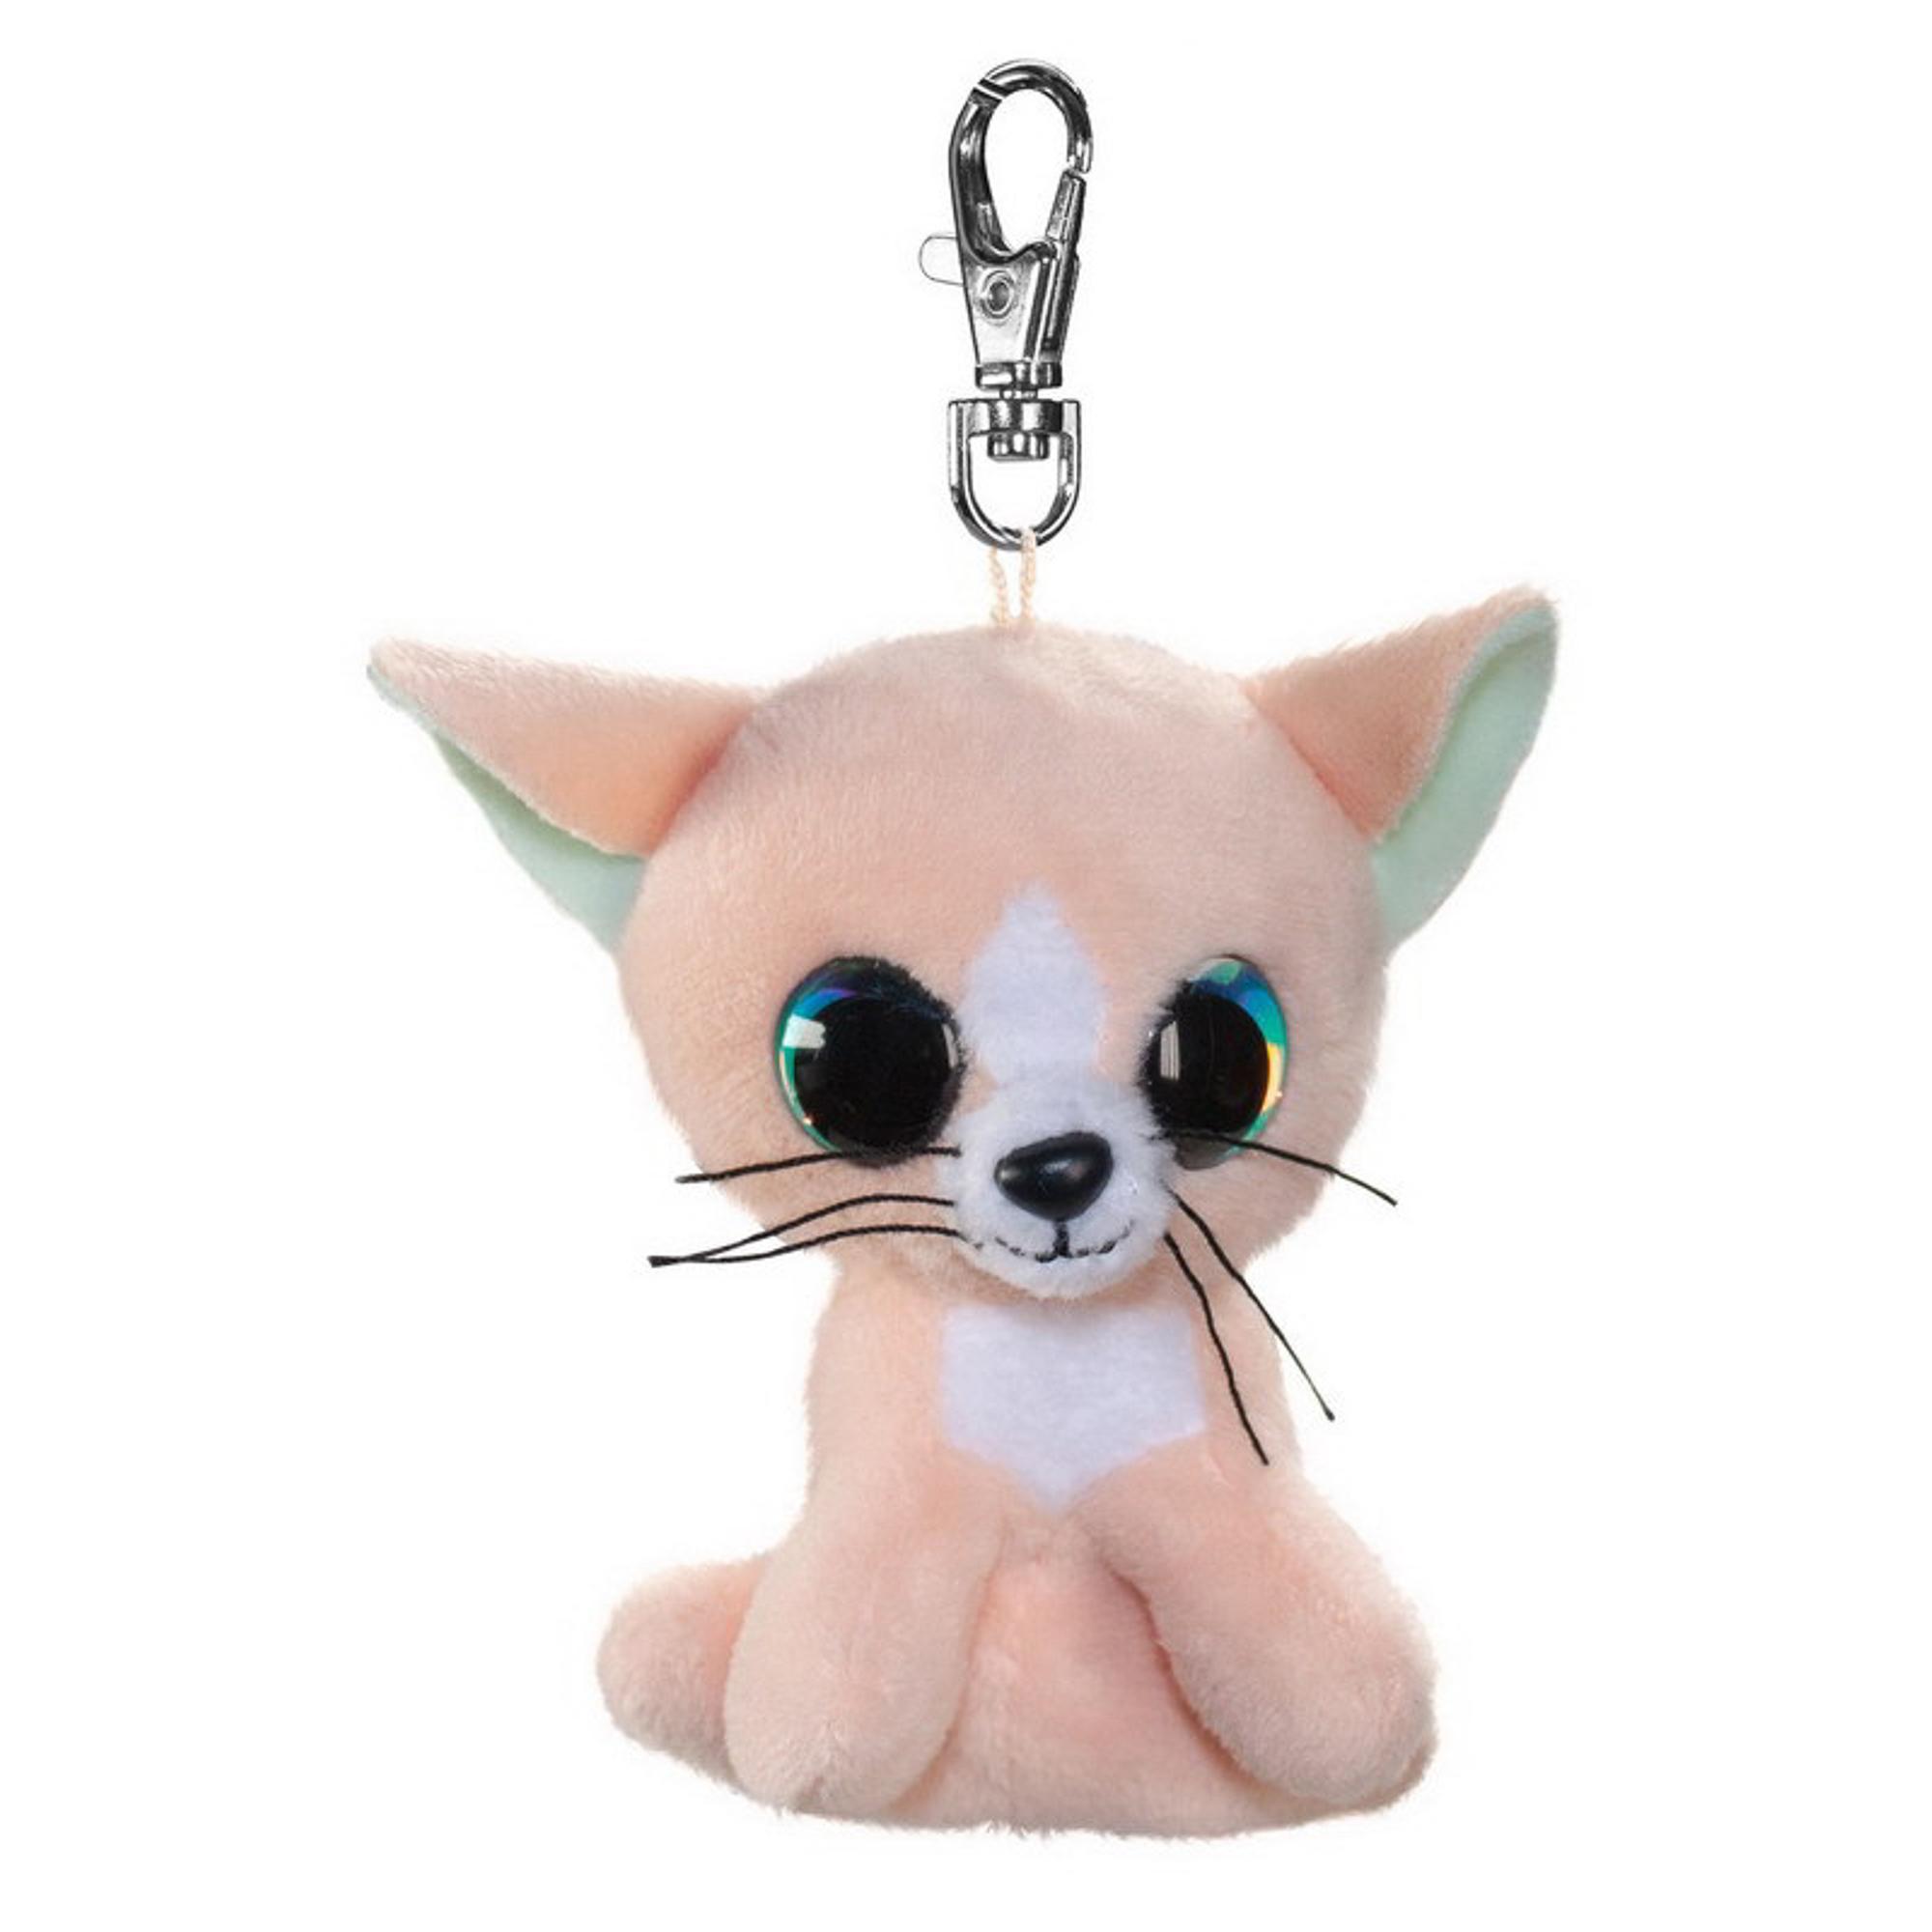 Купить Брелок LUMO Котёнок Peach 8.5 см, брелок, Китай, пластик, иск.мех, текстиль